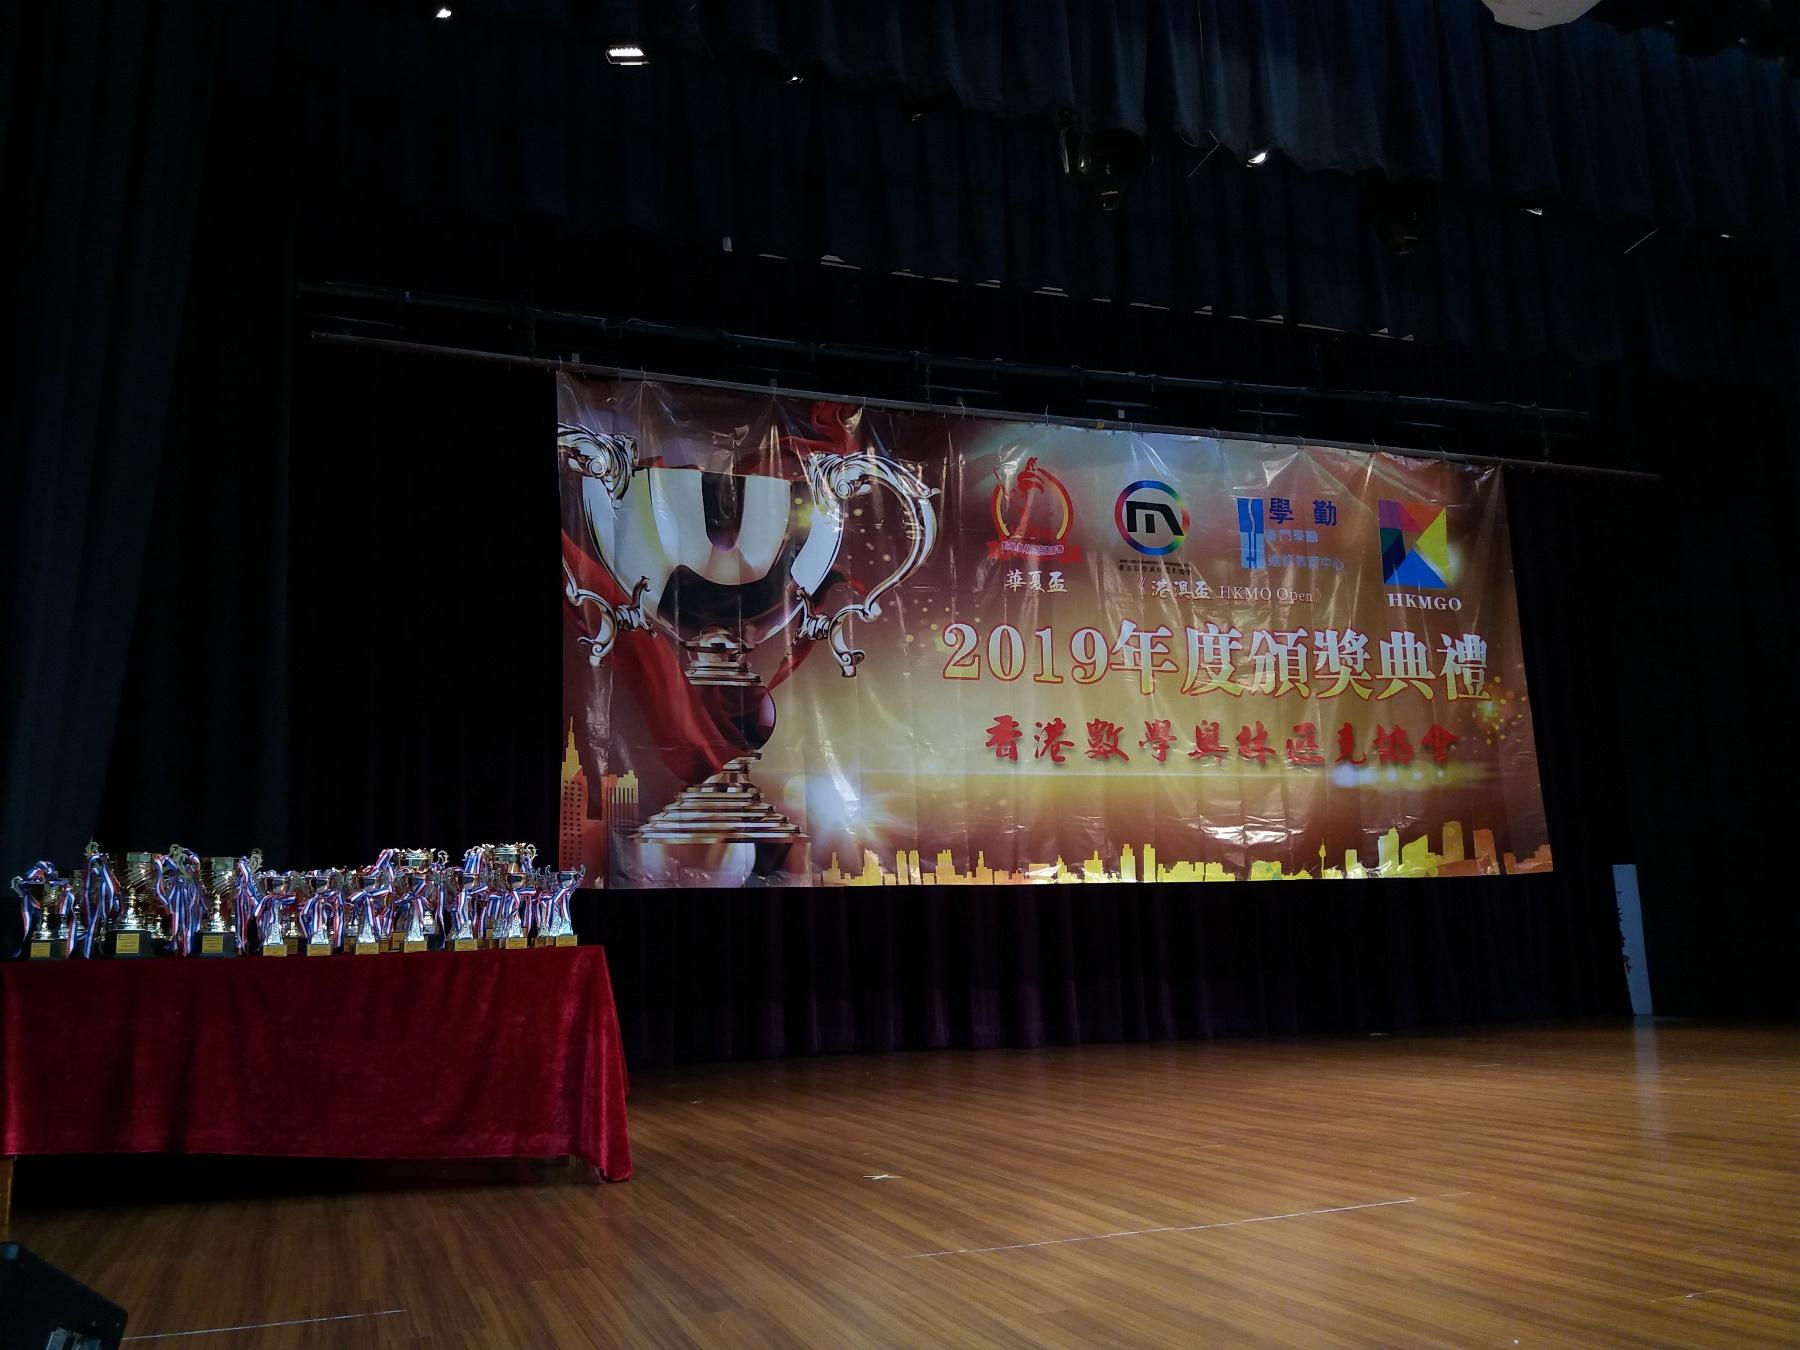 http://npc.edu.hk/sites/default/files/20190607_143415.jpg